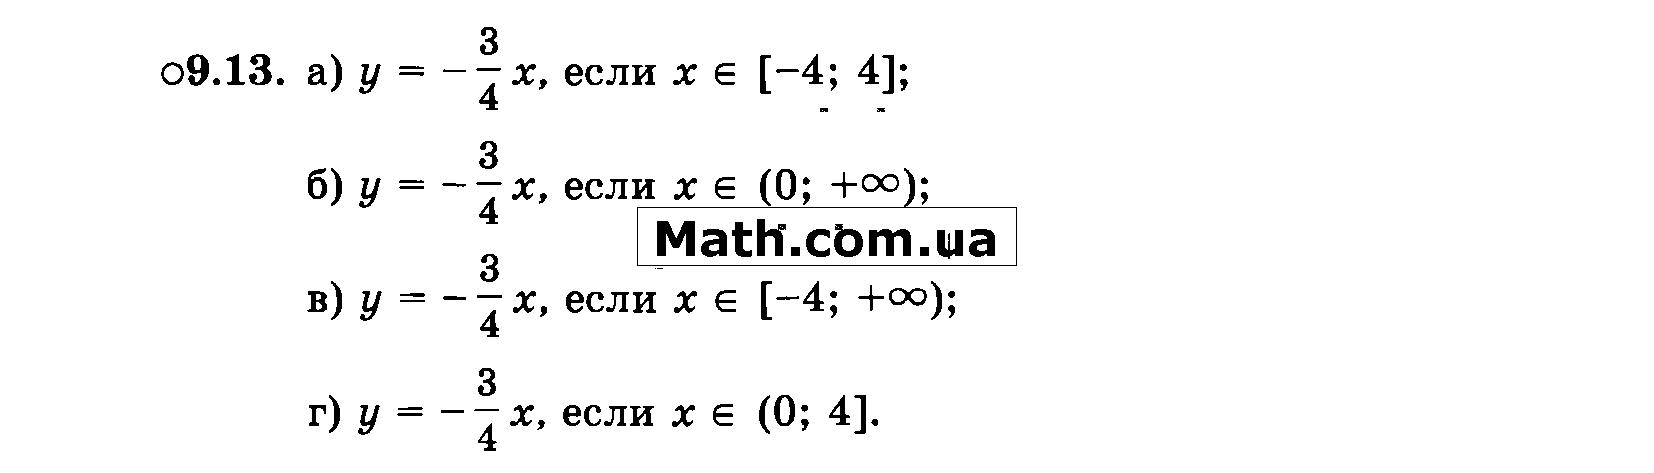 Гдз по алгебре 9 класс мордкович александрова мишустина.